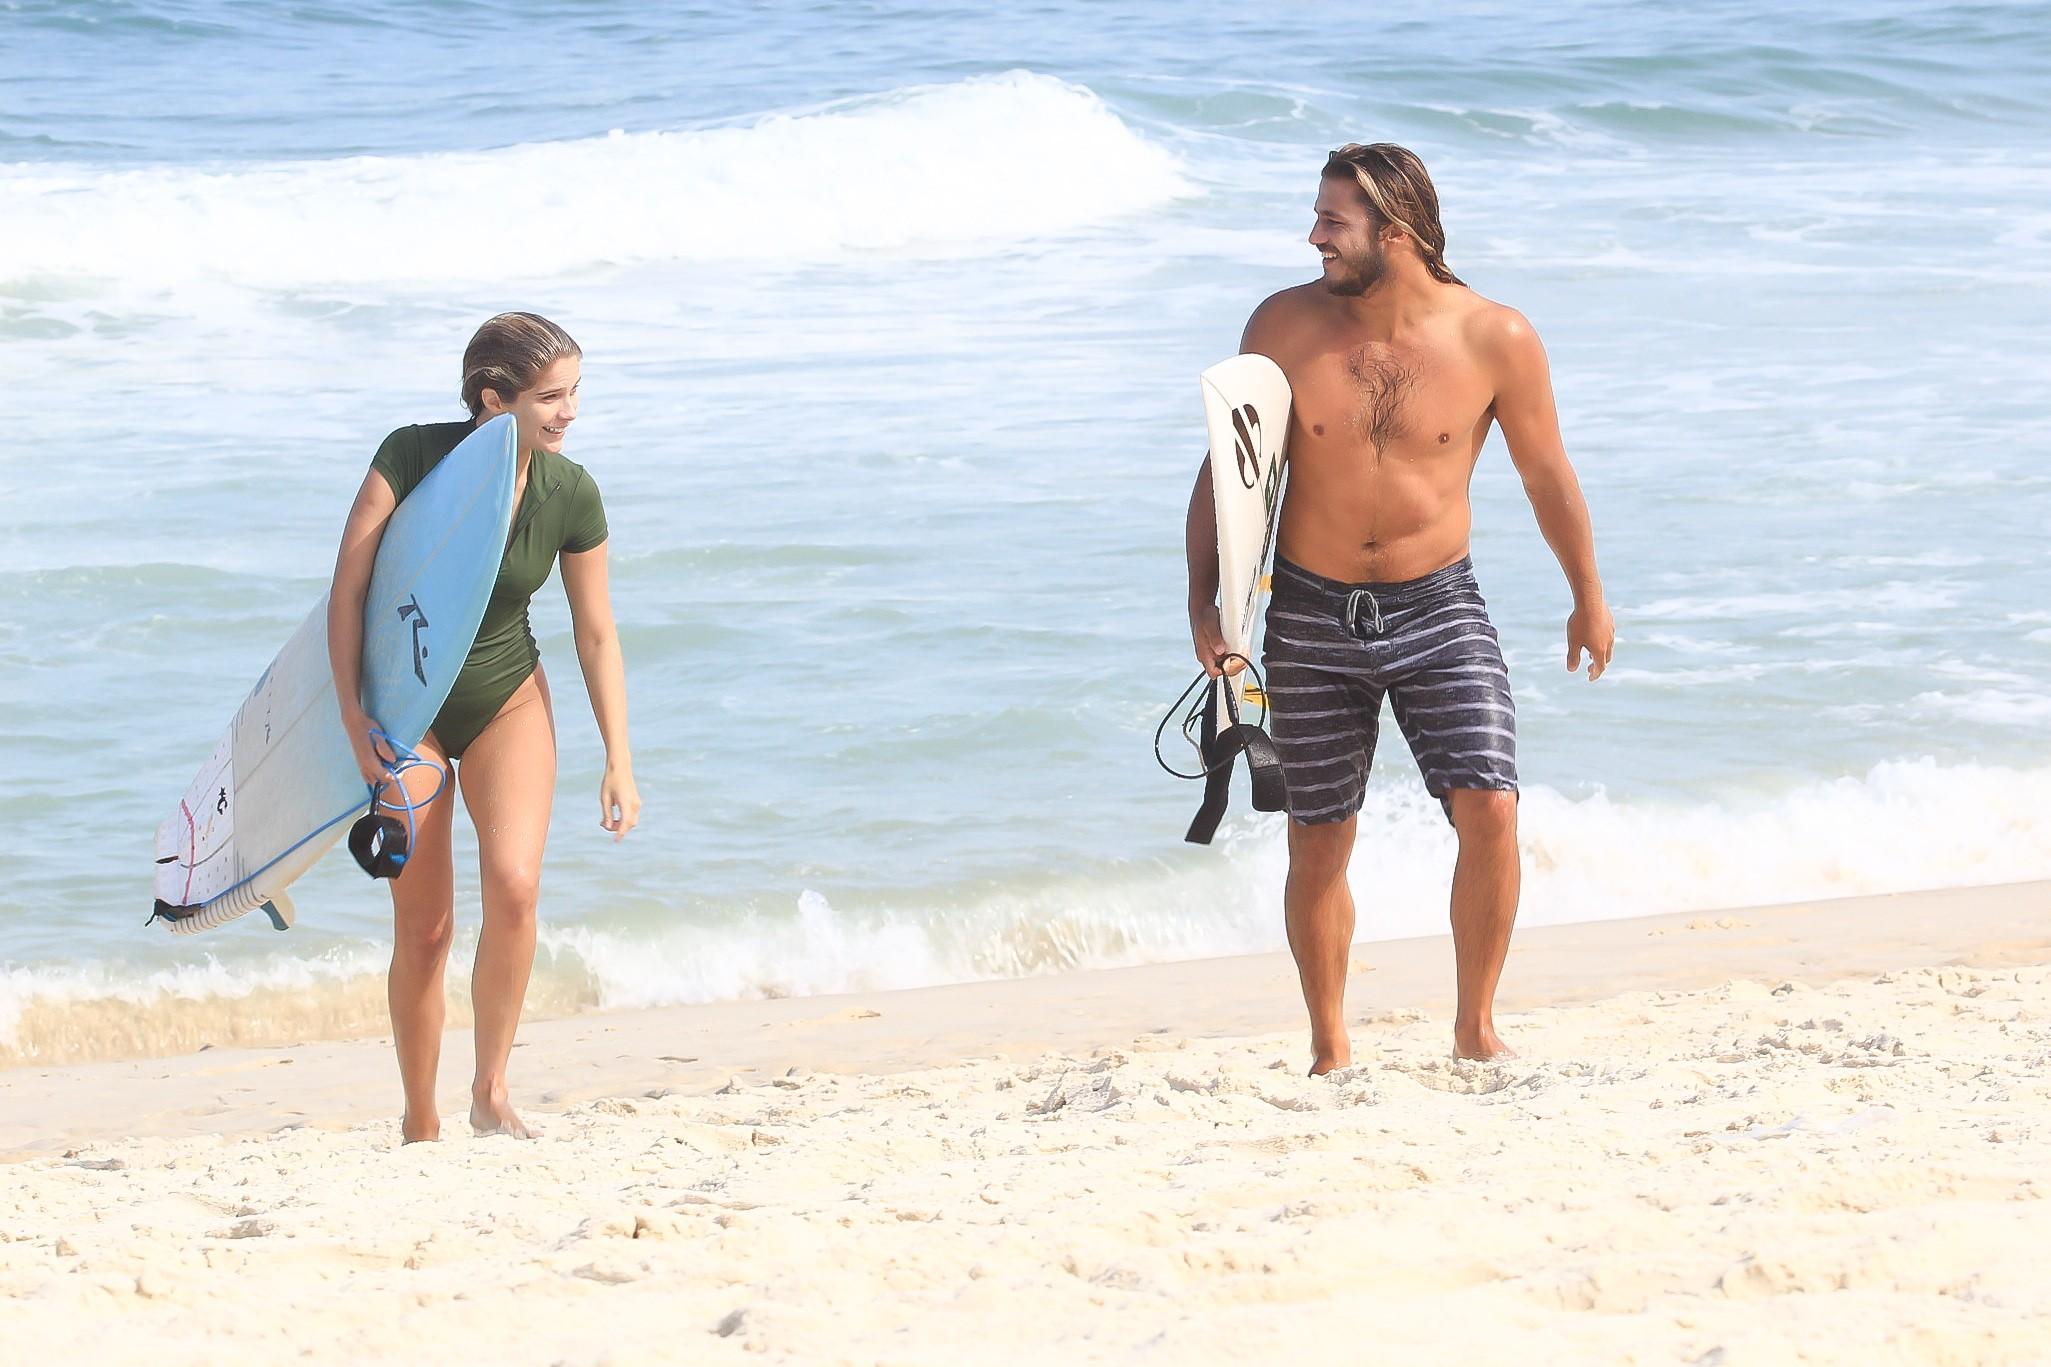 Isabella Santoni surfa com o namorado na Barrada Tijuca (Foto: Fabricio Pioyani /AgNews)